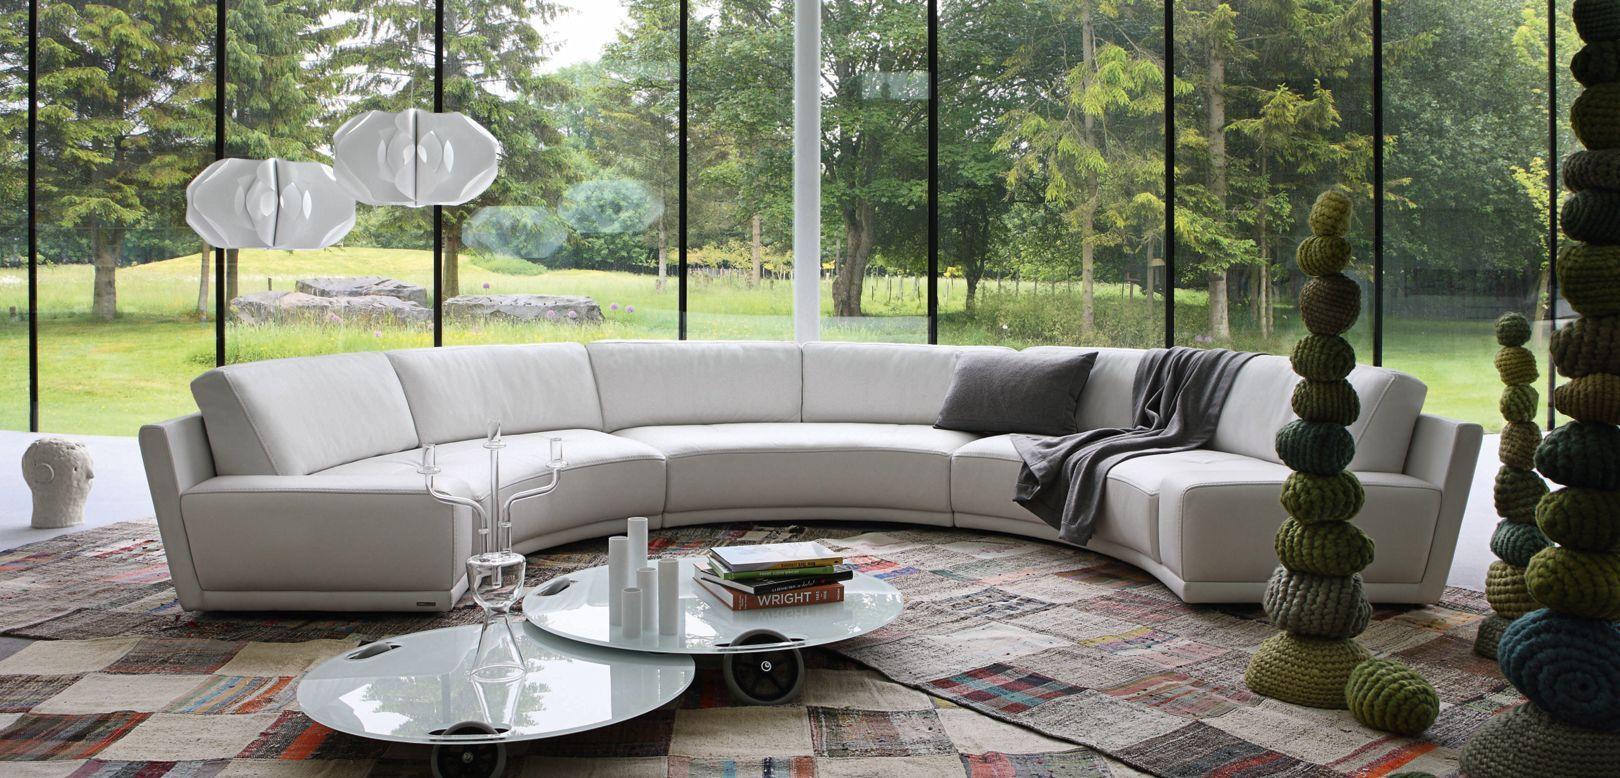 roche bobois floor cushion seating. Roche Bobois - SOLSTICE Round Modular Sofa #rochebobois #sofa #nature #lounge # Floor Cushion Seating